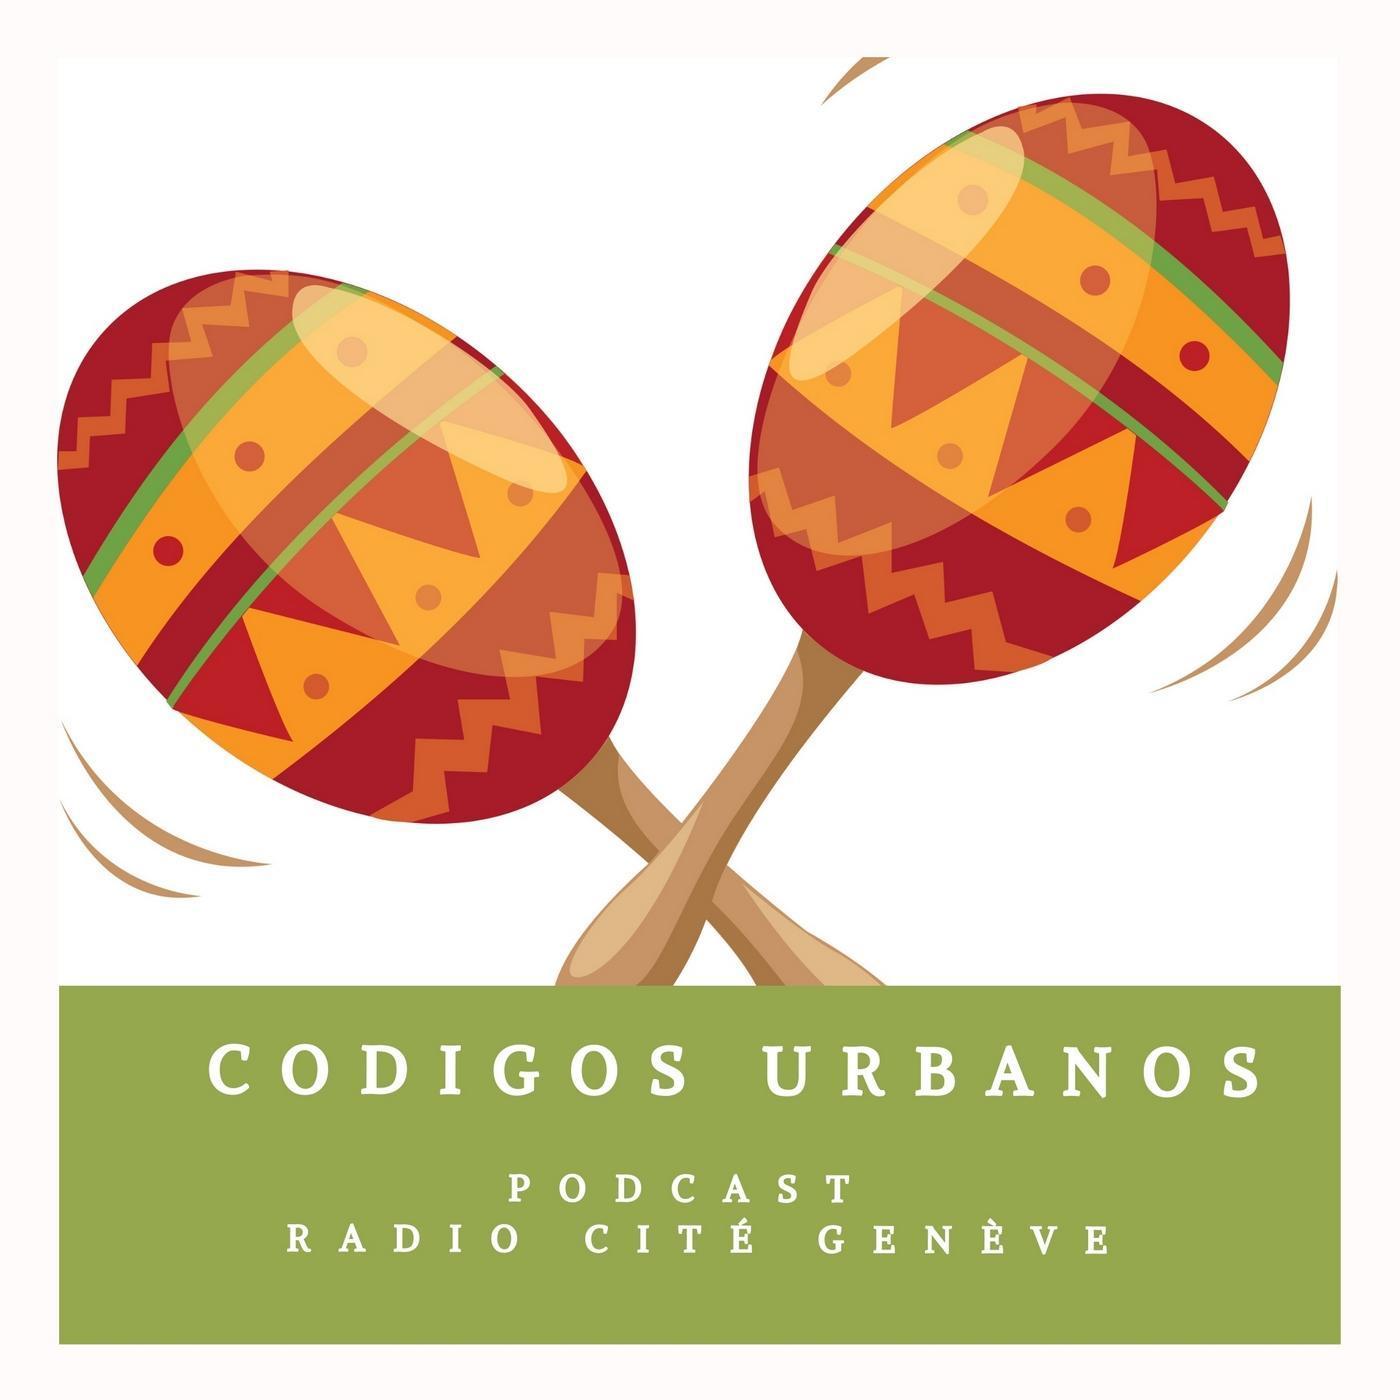 Codigos Urbanos - 27/04/21